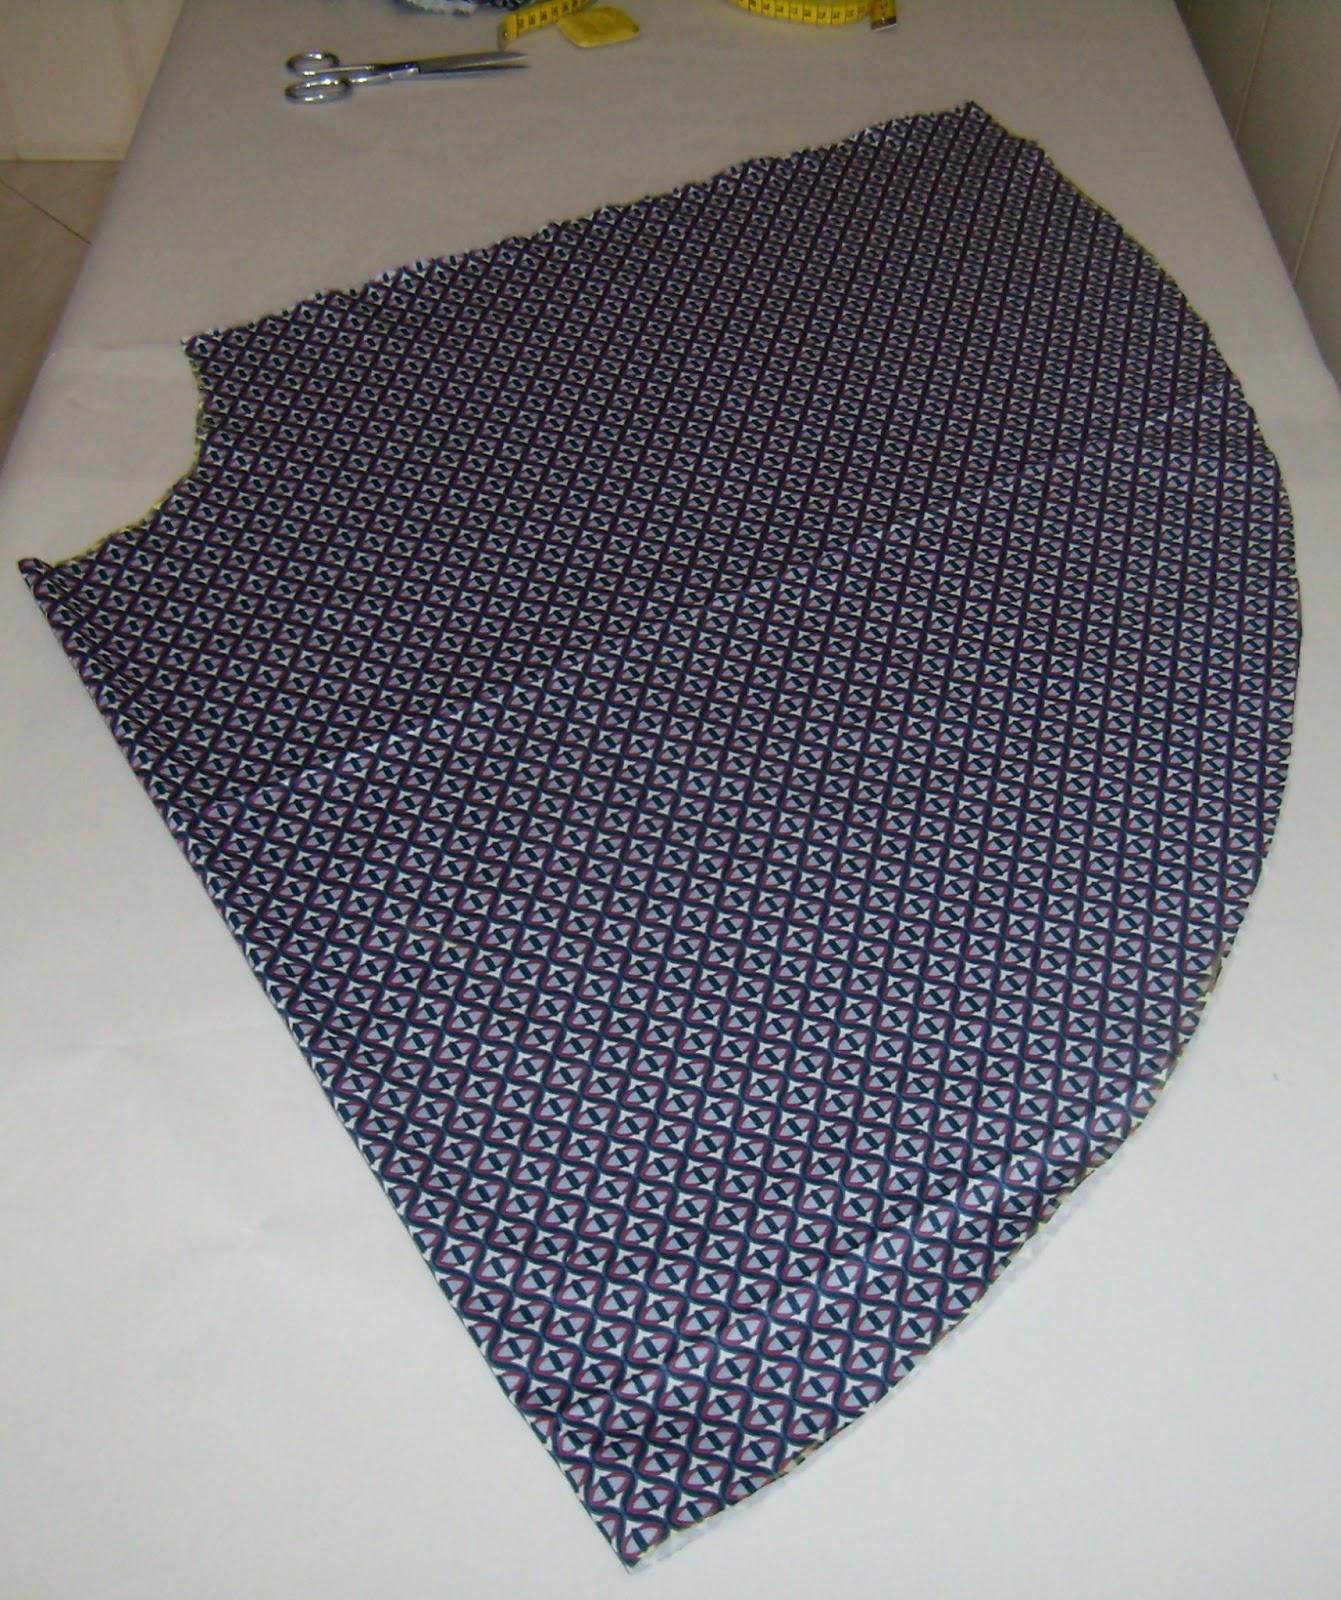 Шитье юбка солнце-клеш мастер класс пошагово #2